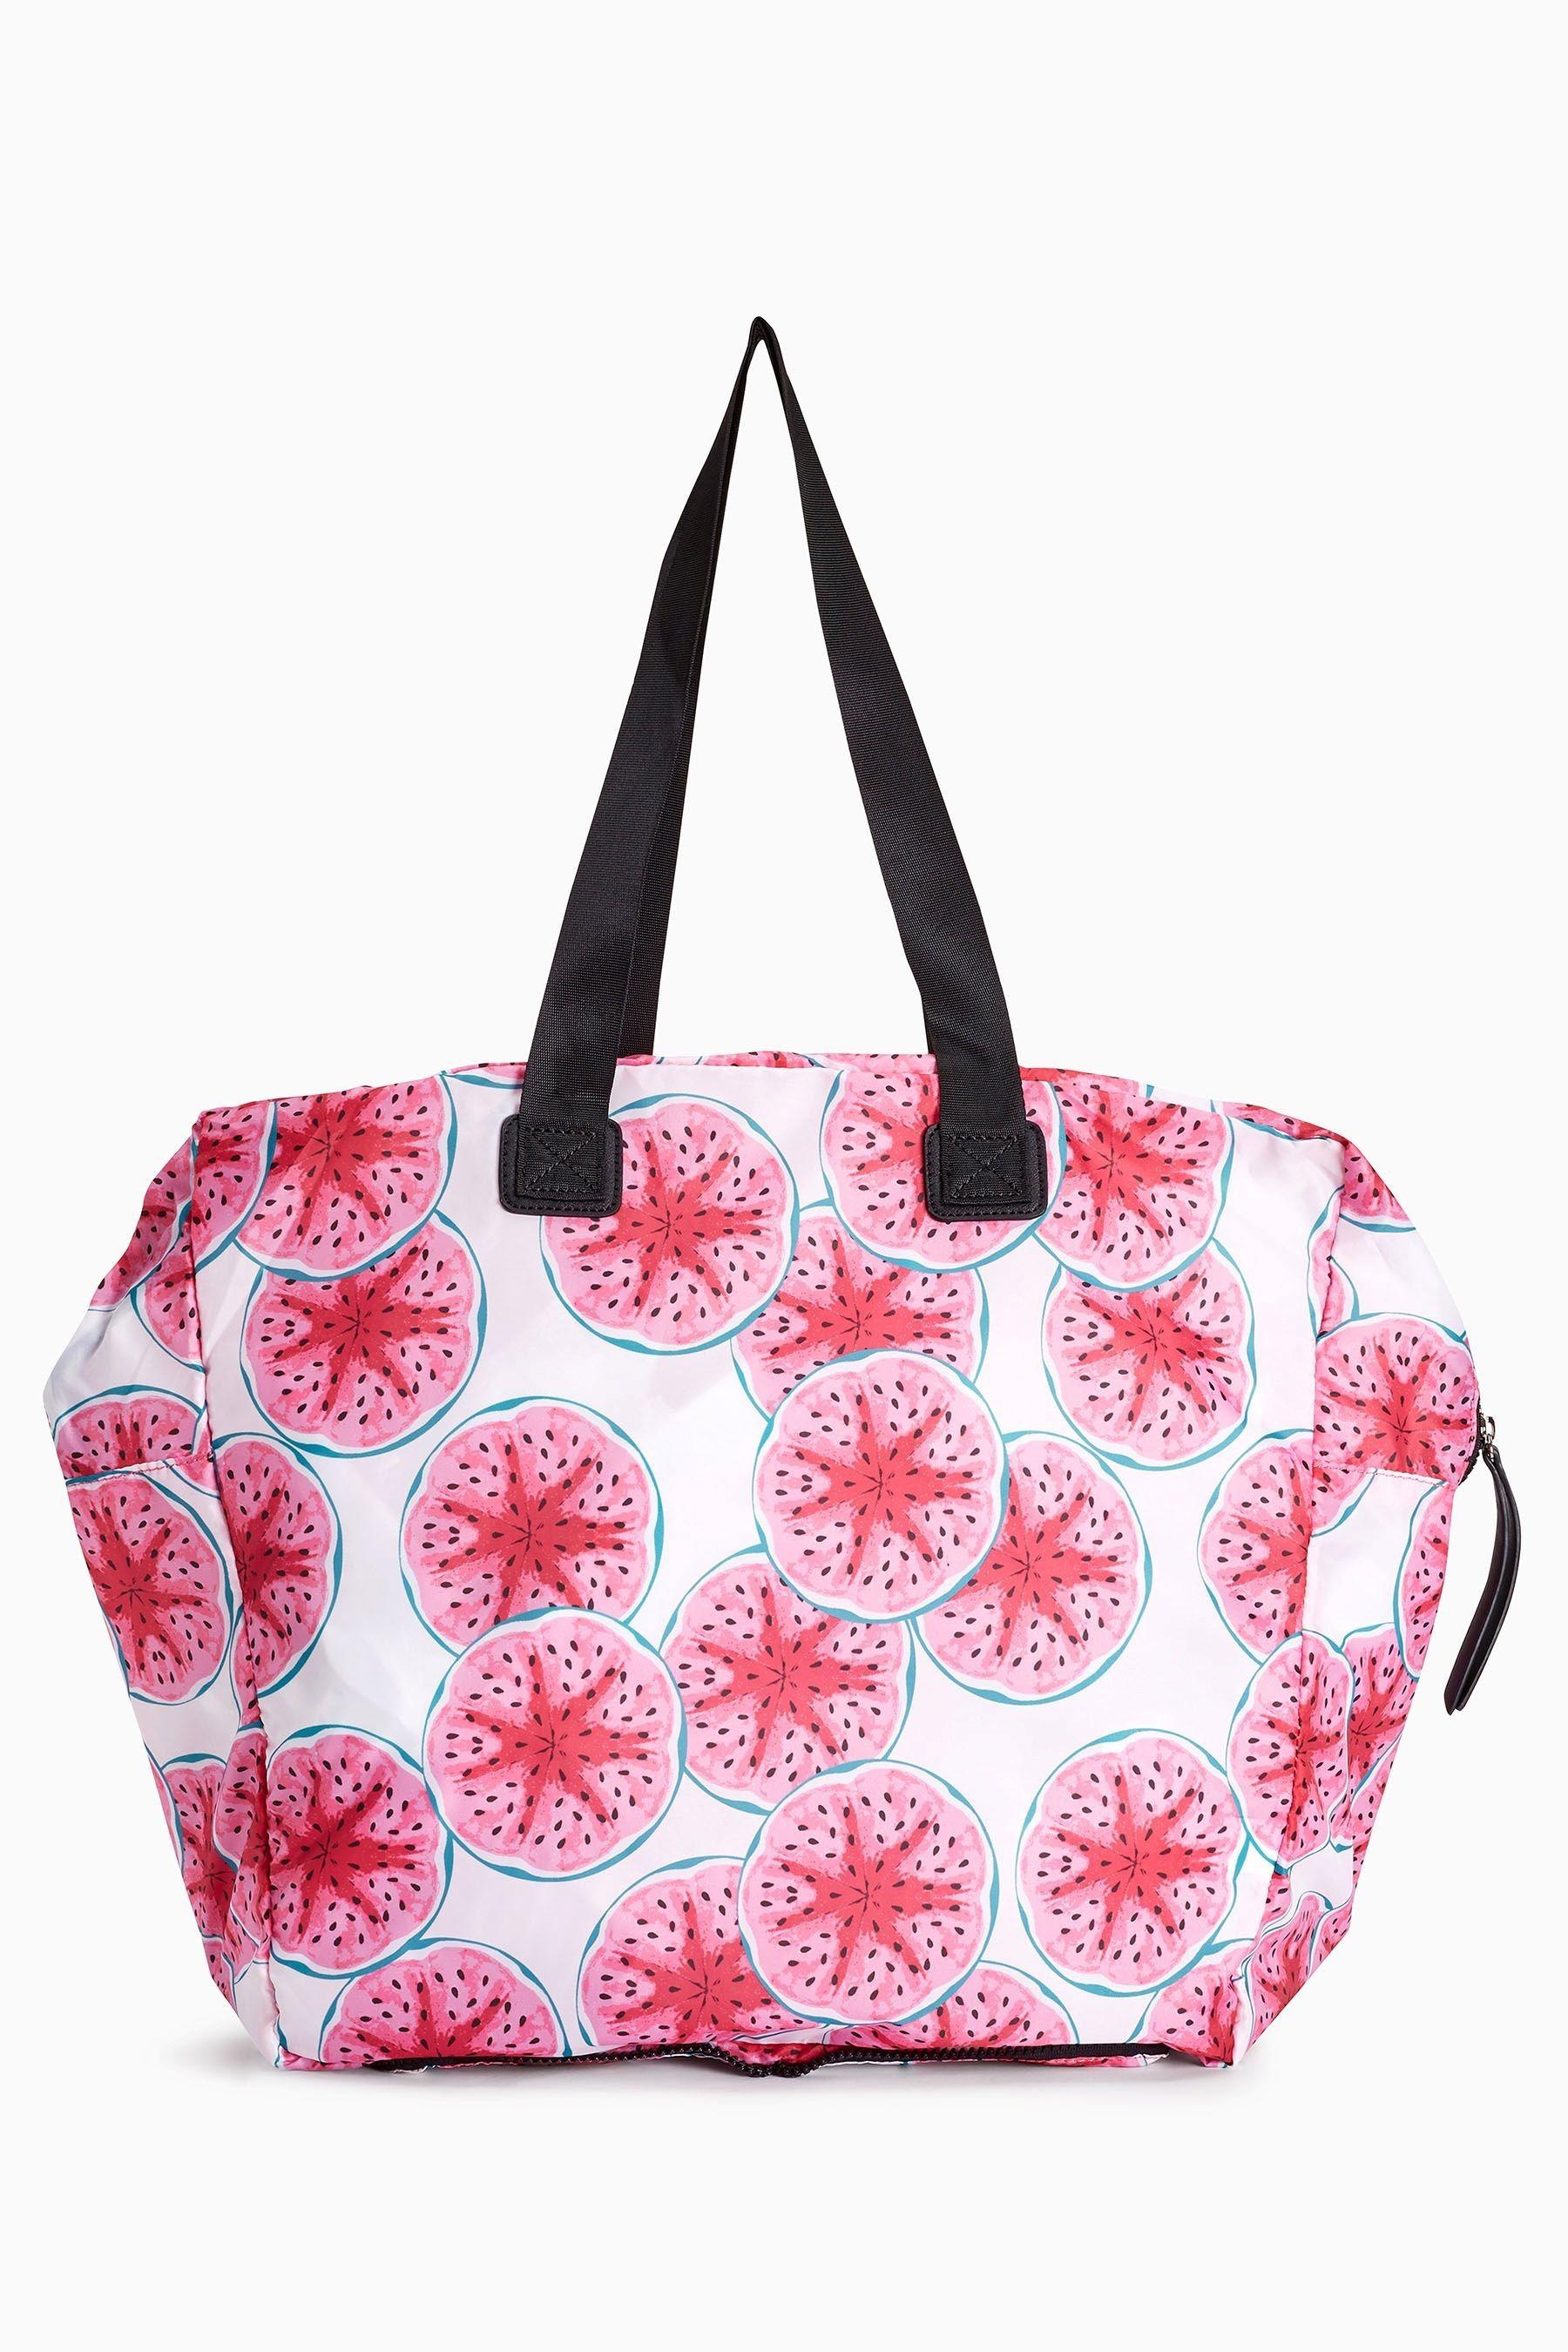 Faltbare Shopper-Tasche